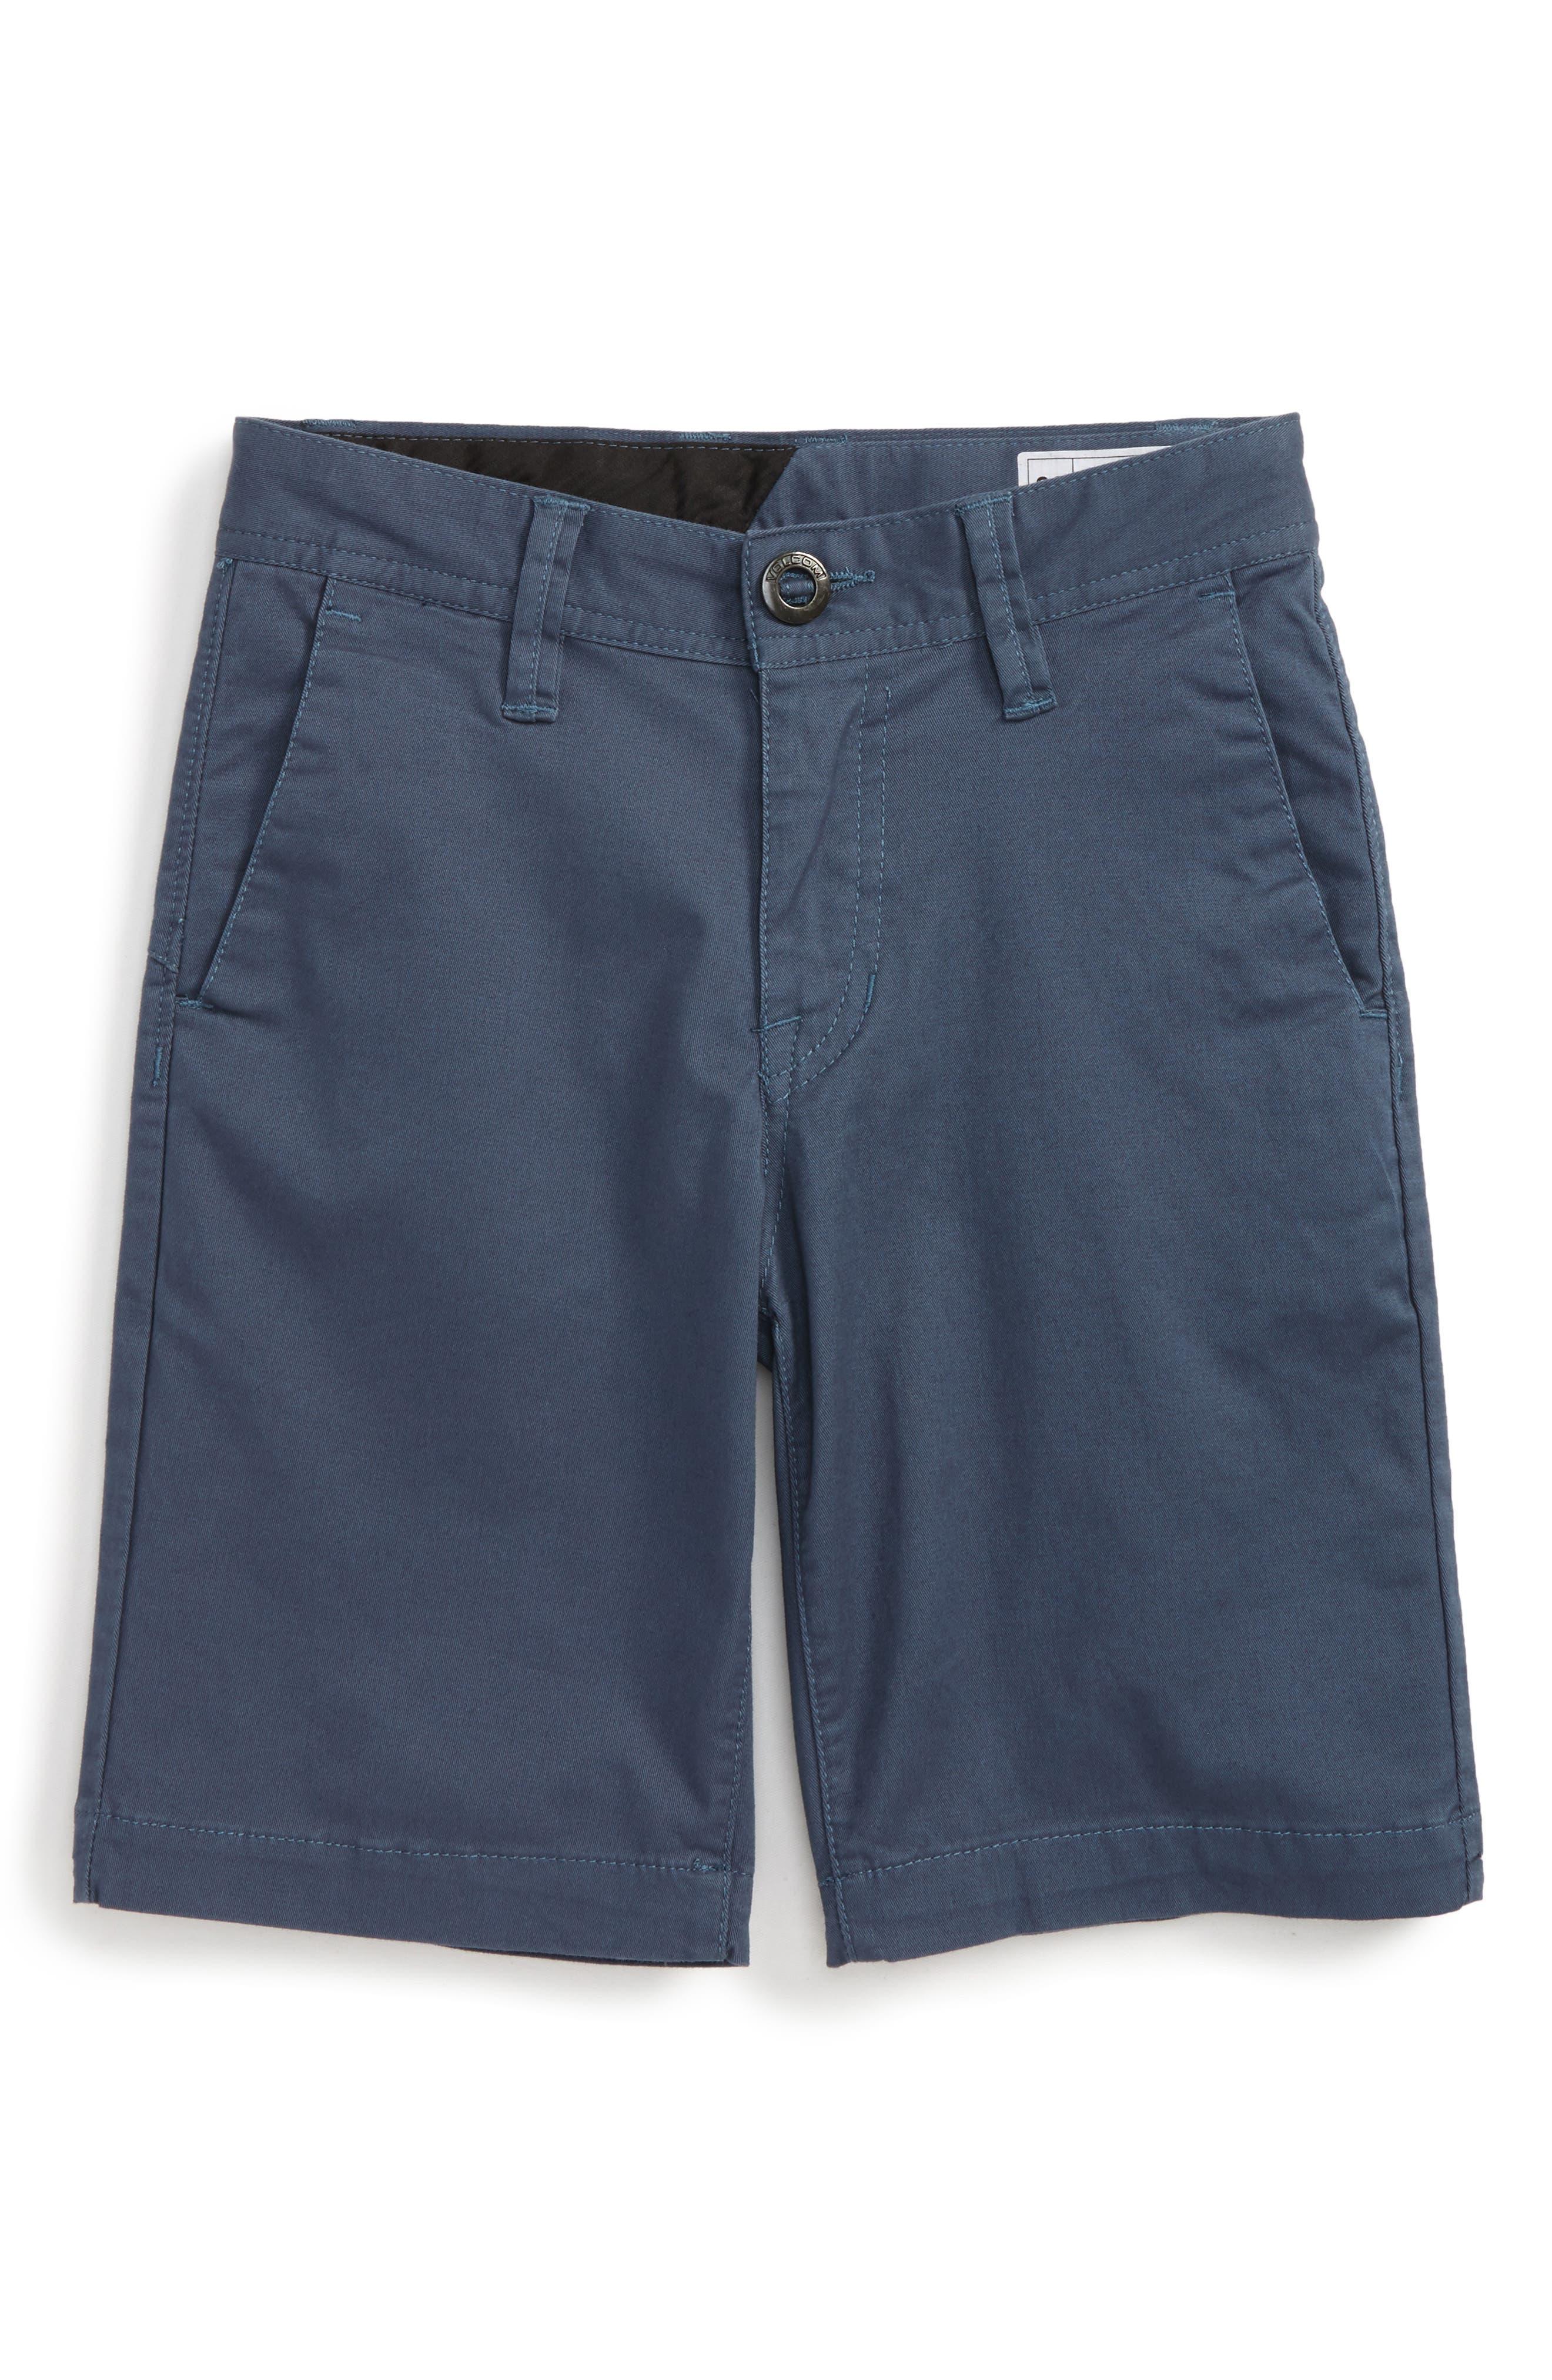 Cotton Twill Shorts,                             Main thumbnail 1, color,                             Blue Air